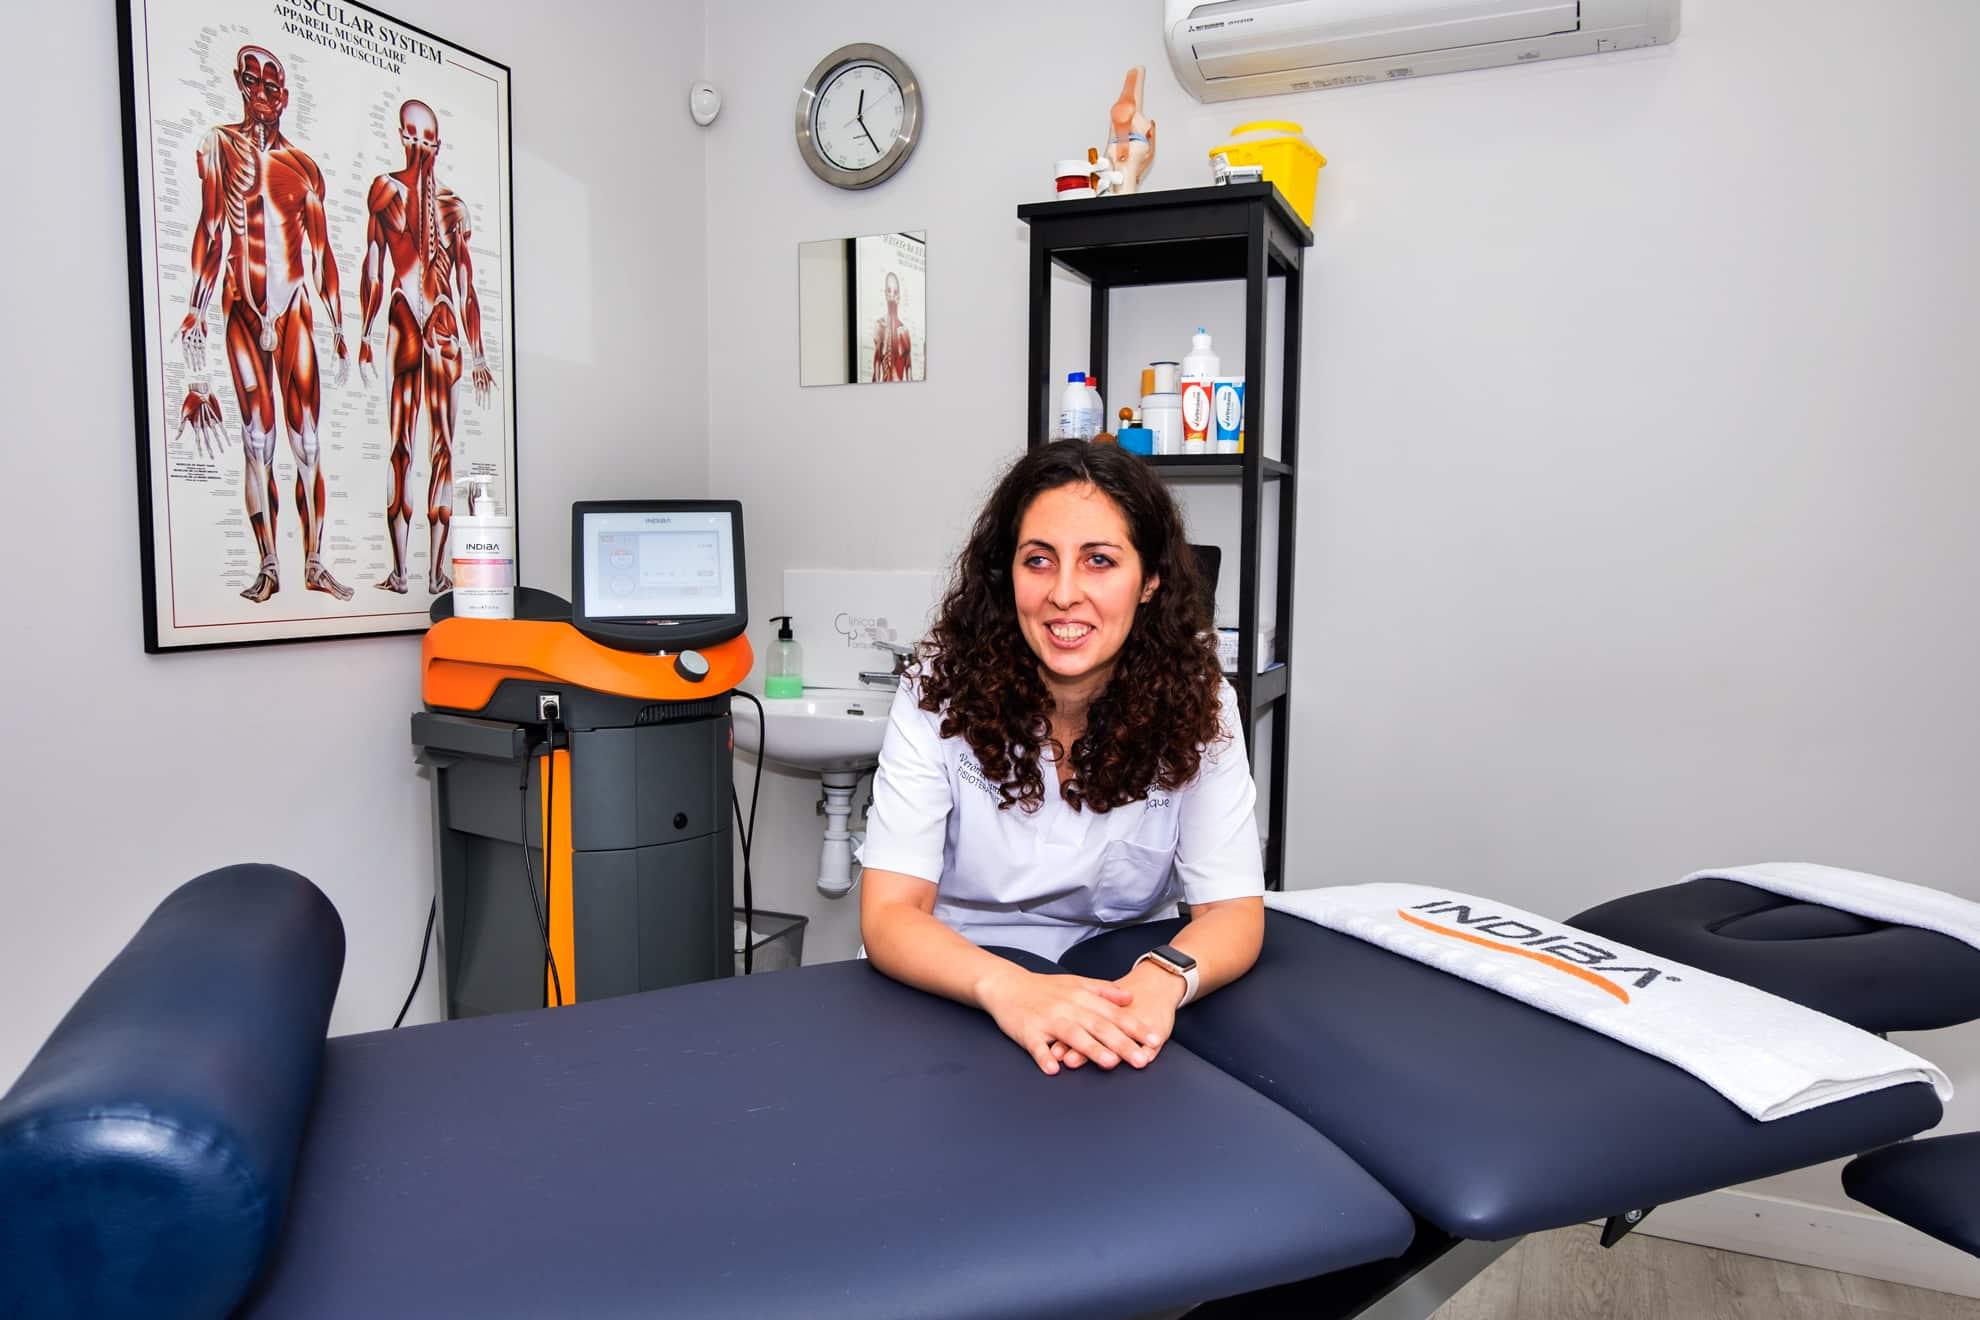 Verónica Barrios Fisioterapeuta experta en terapia manual osteopática